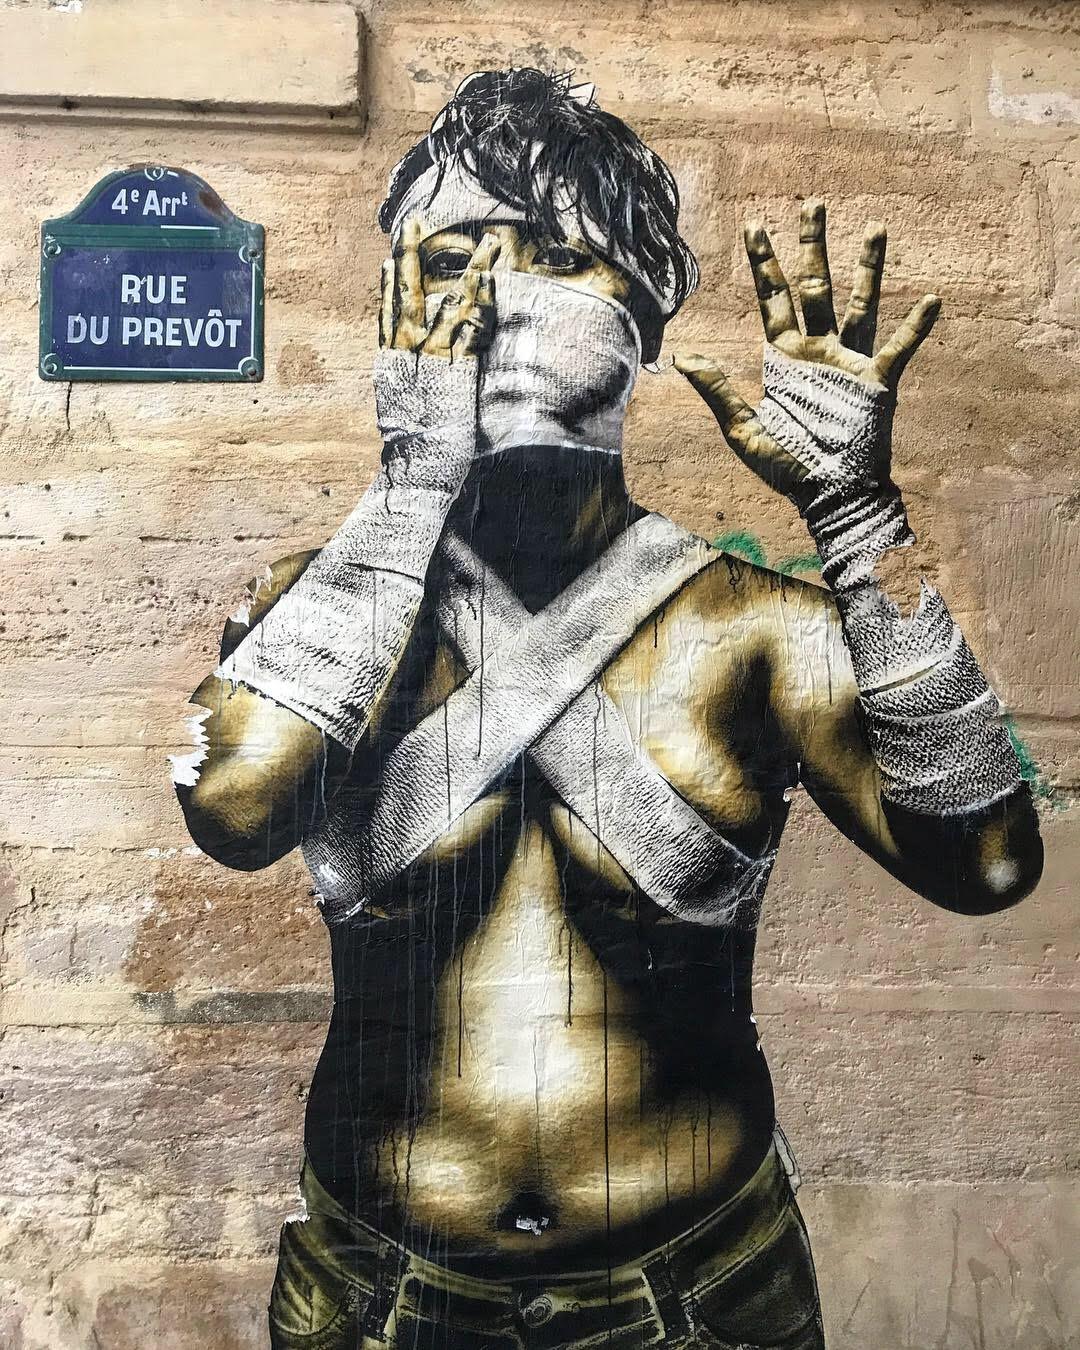 Street art in Paris, France